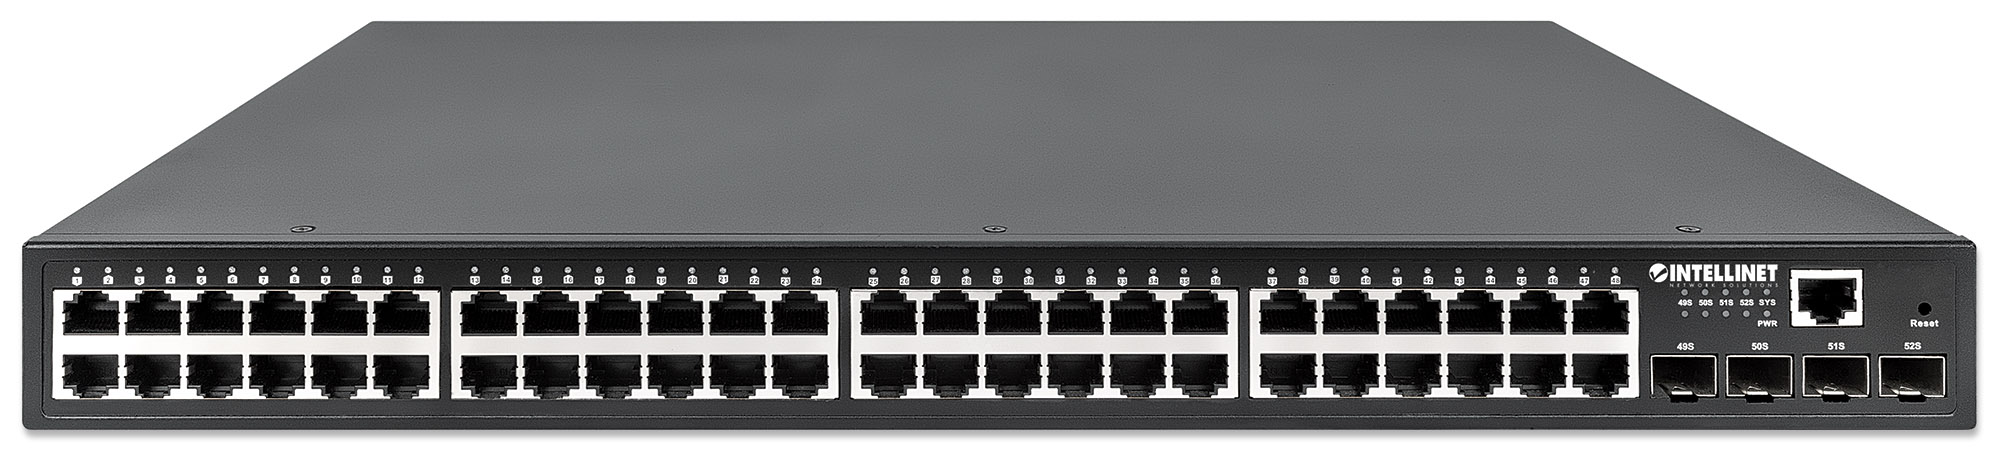 48-Port Gigabit Ethernet PoE+ Layer2+ Managed Switch with Four 10G SFP+ Uplinks